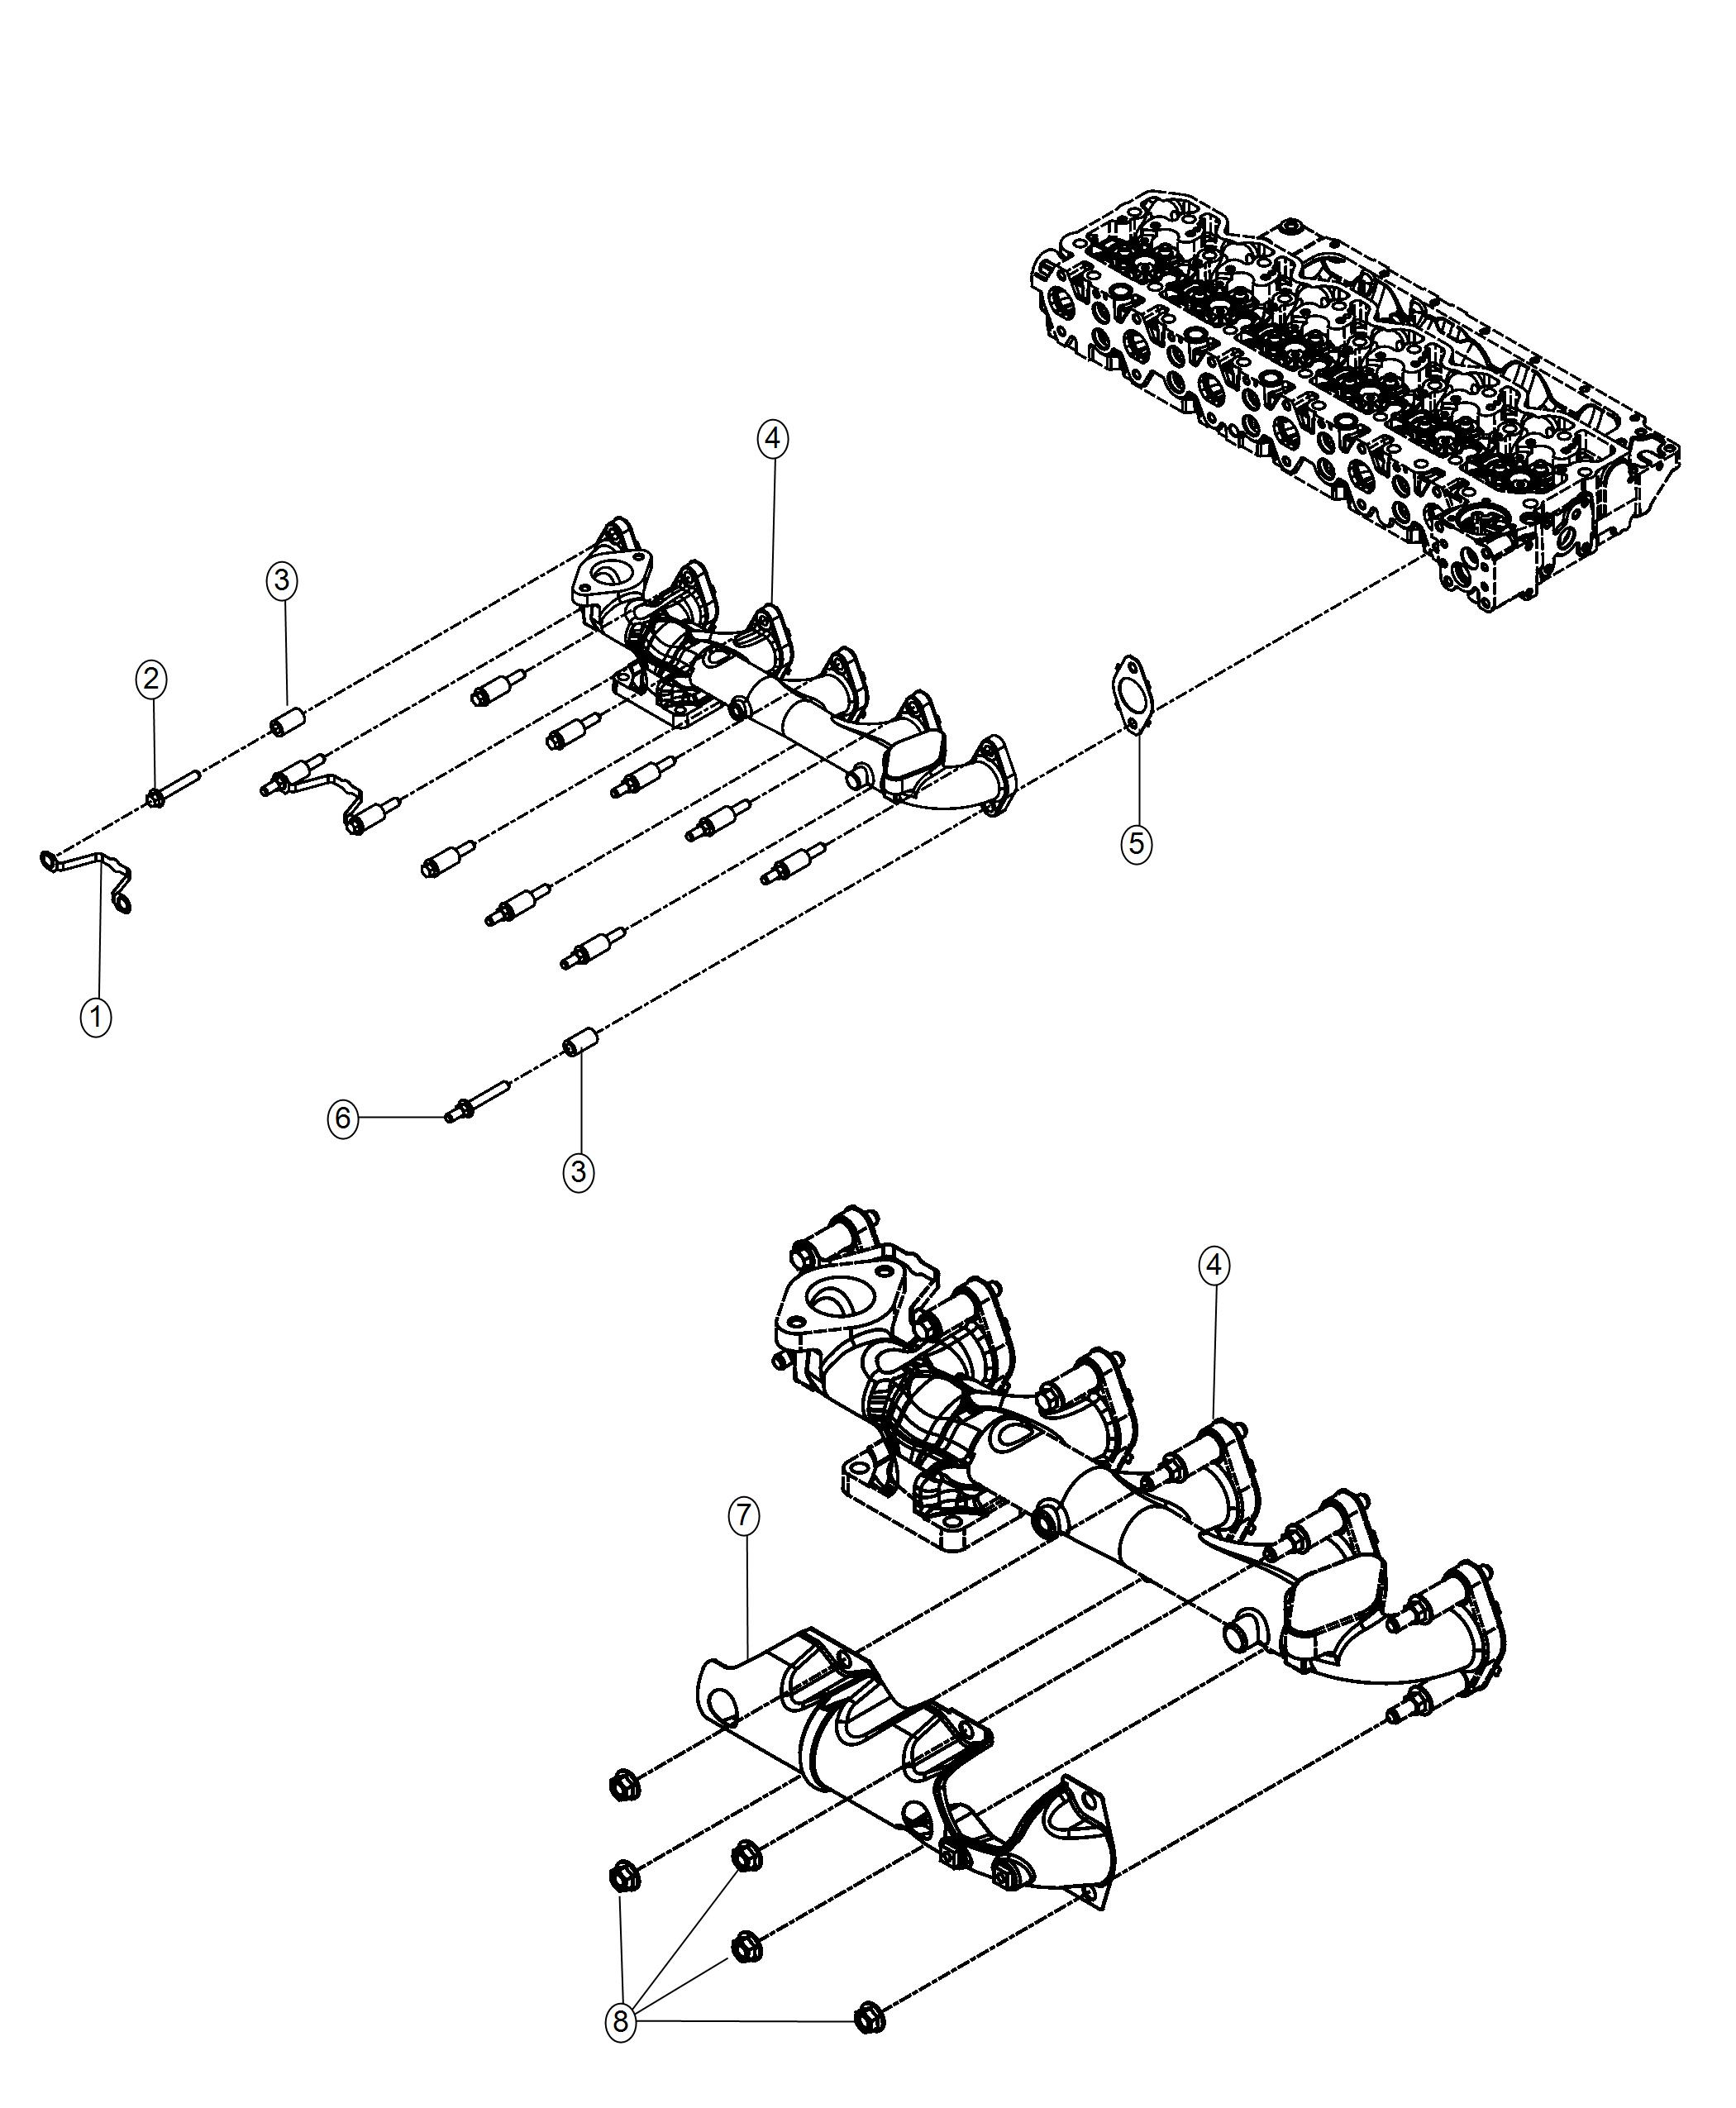 Ram Manifold Exhaust